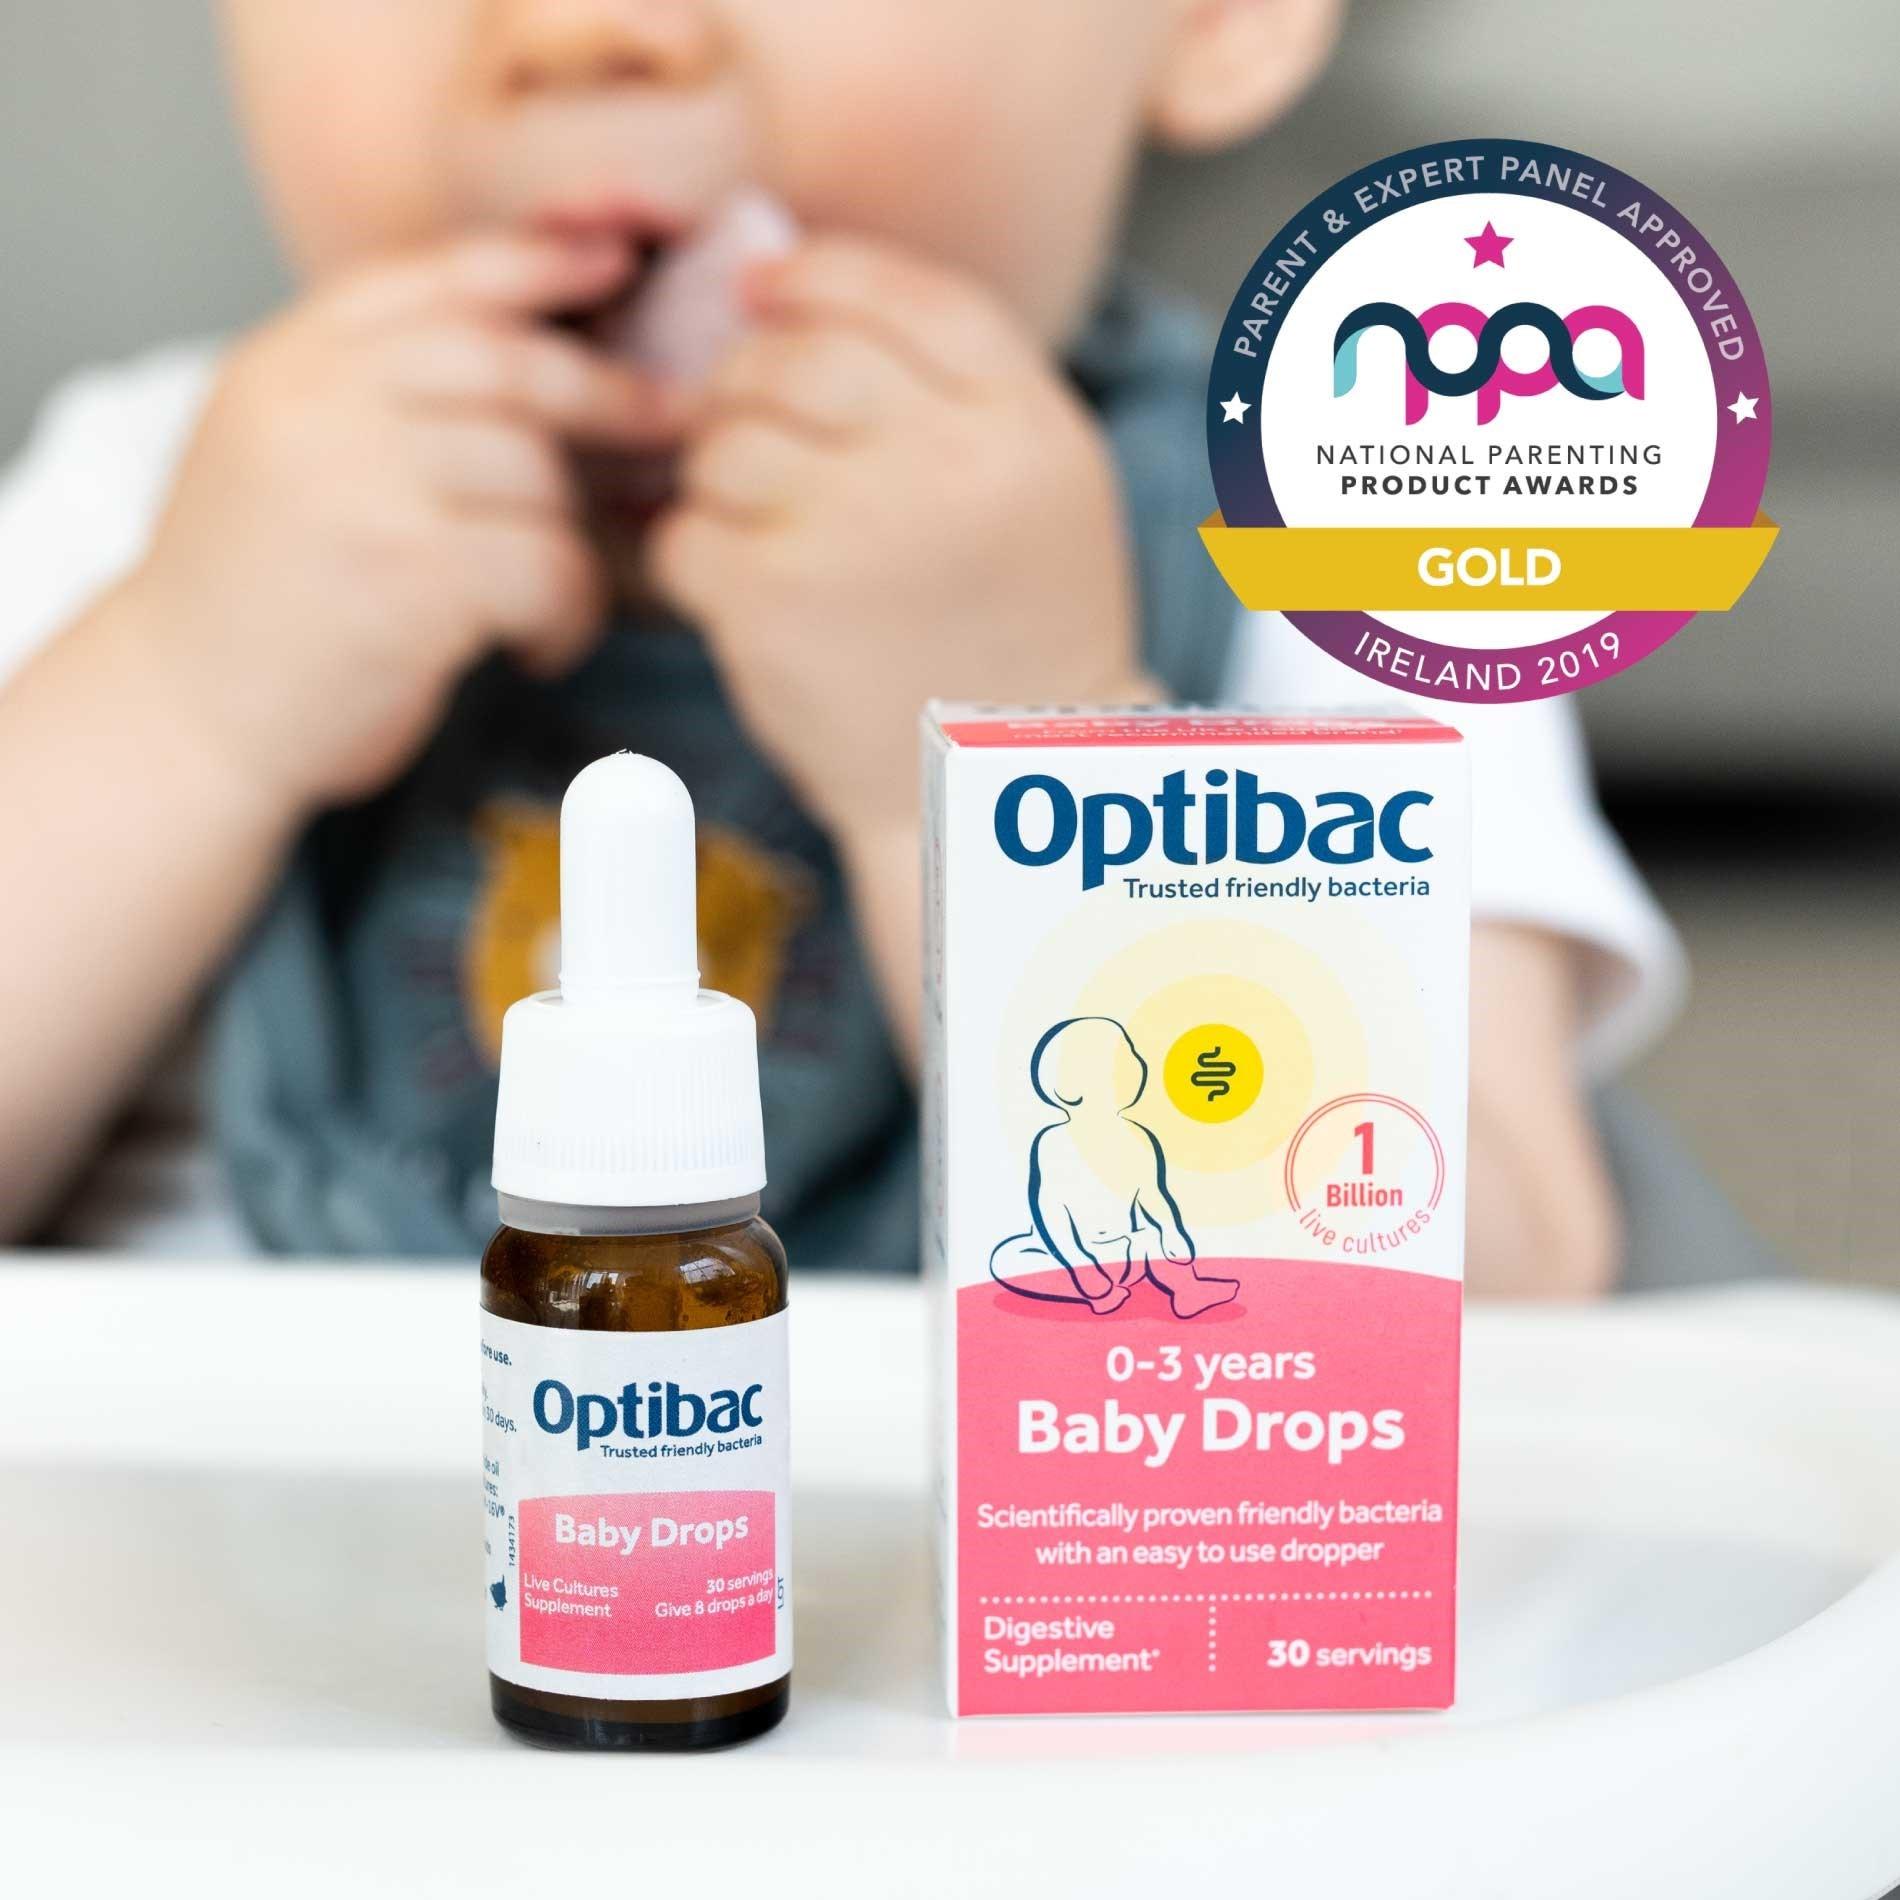 National Parenting Product Award Winner